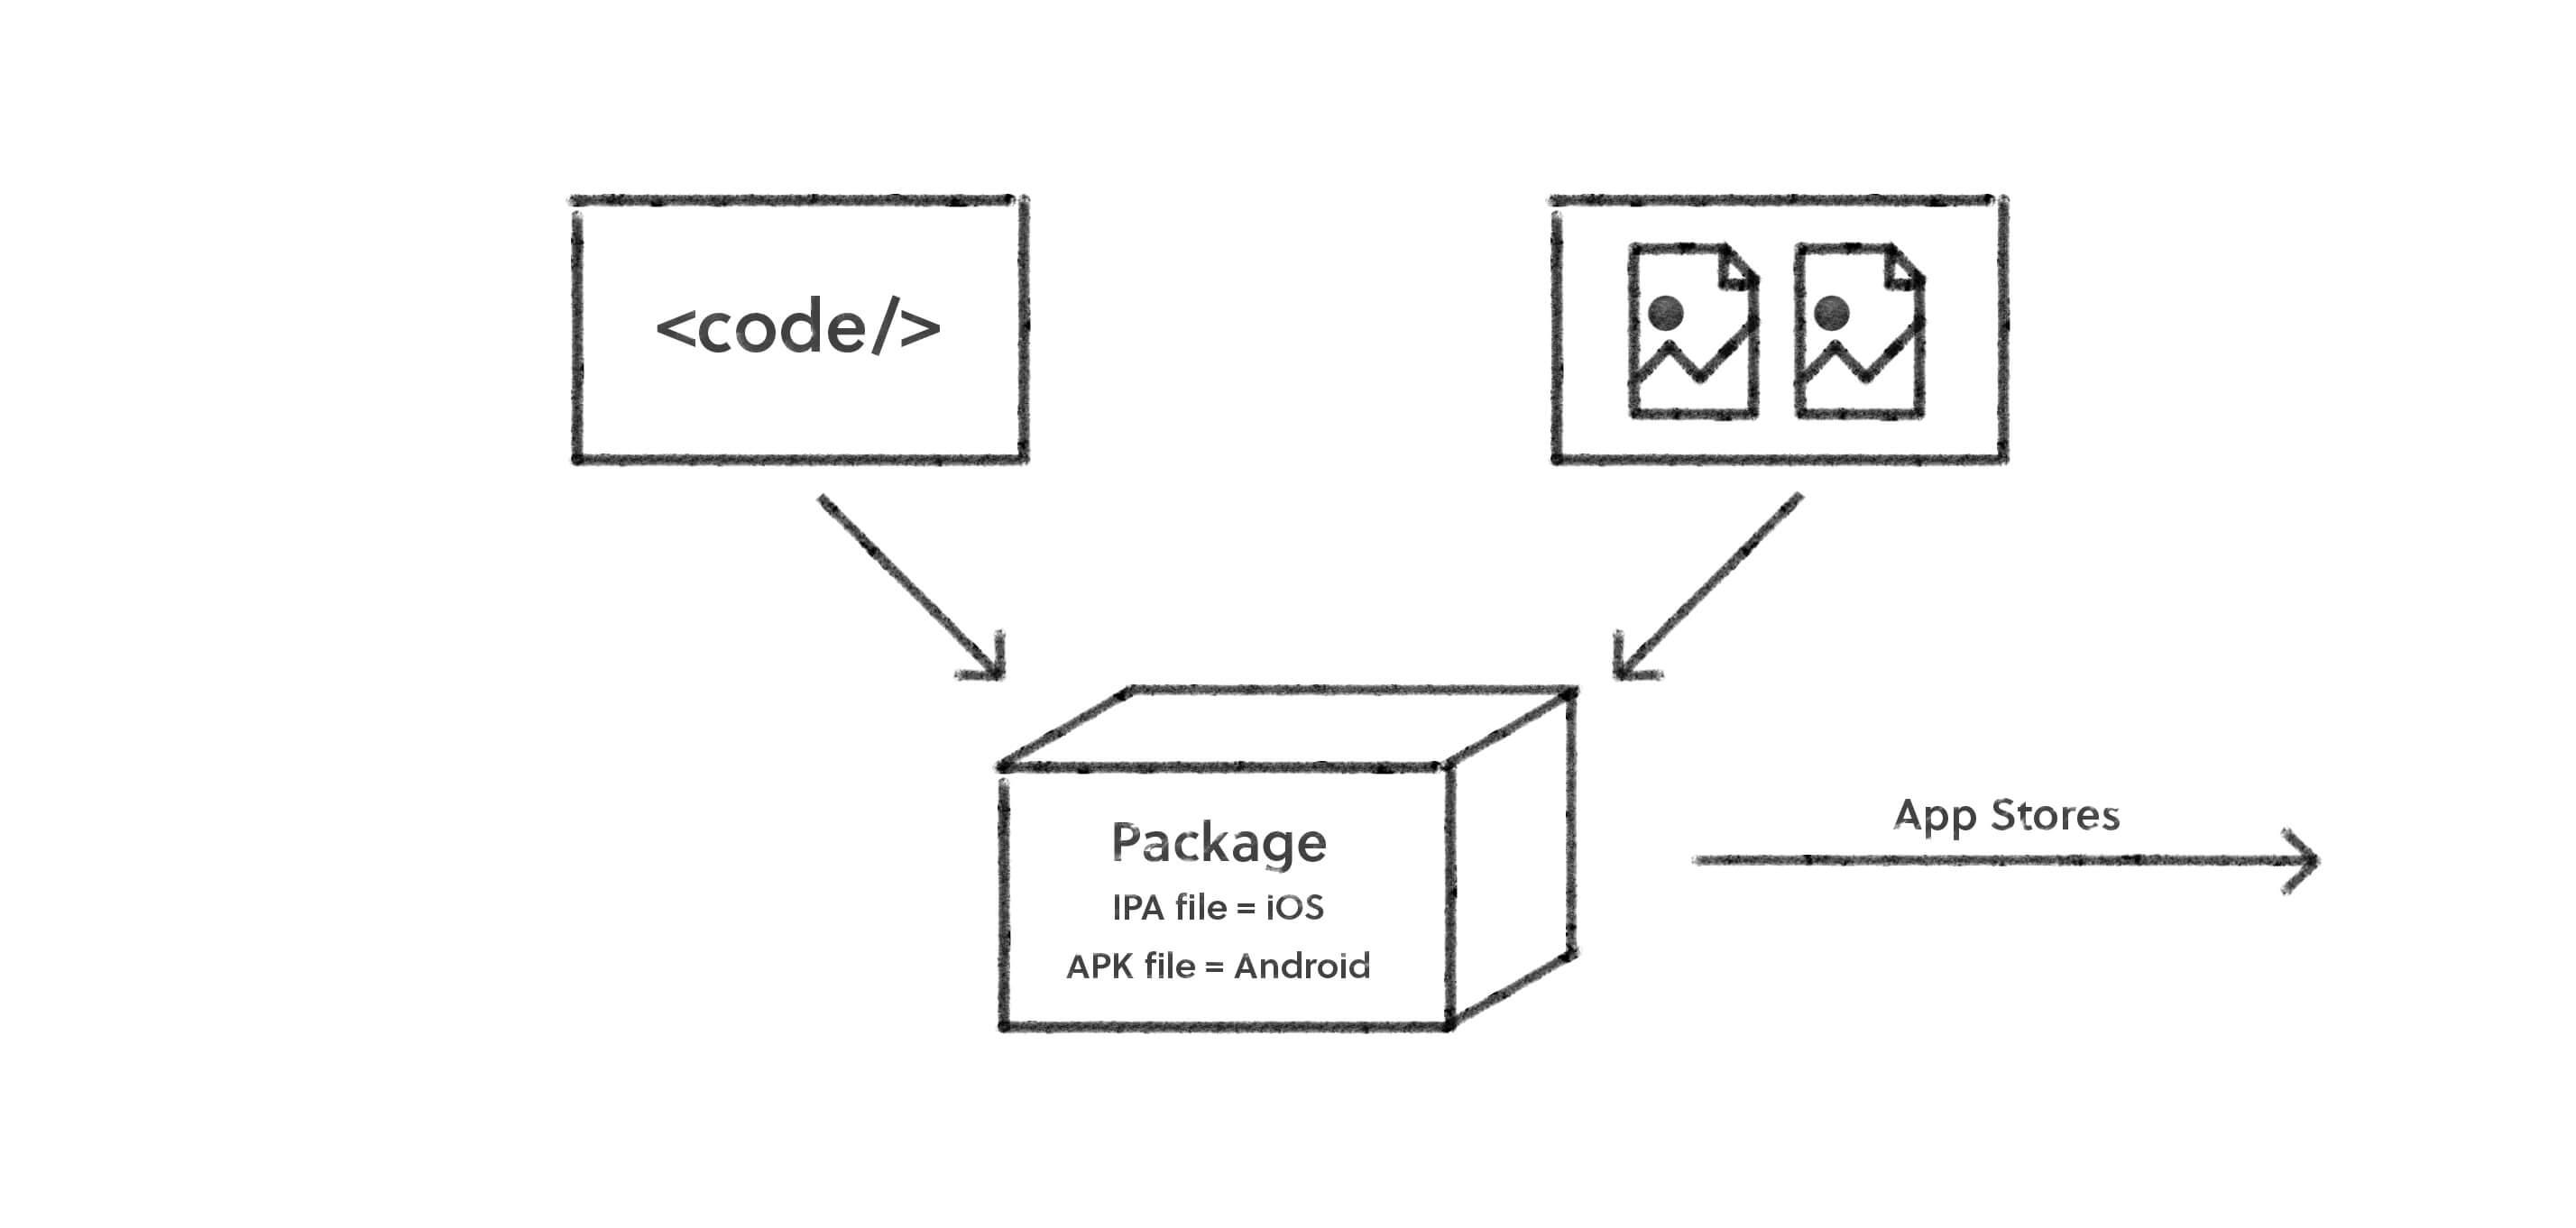 M2mobi - Web, Cross-platform, Hybrid or Native? What's the